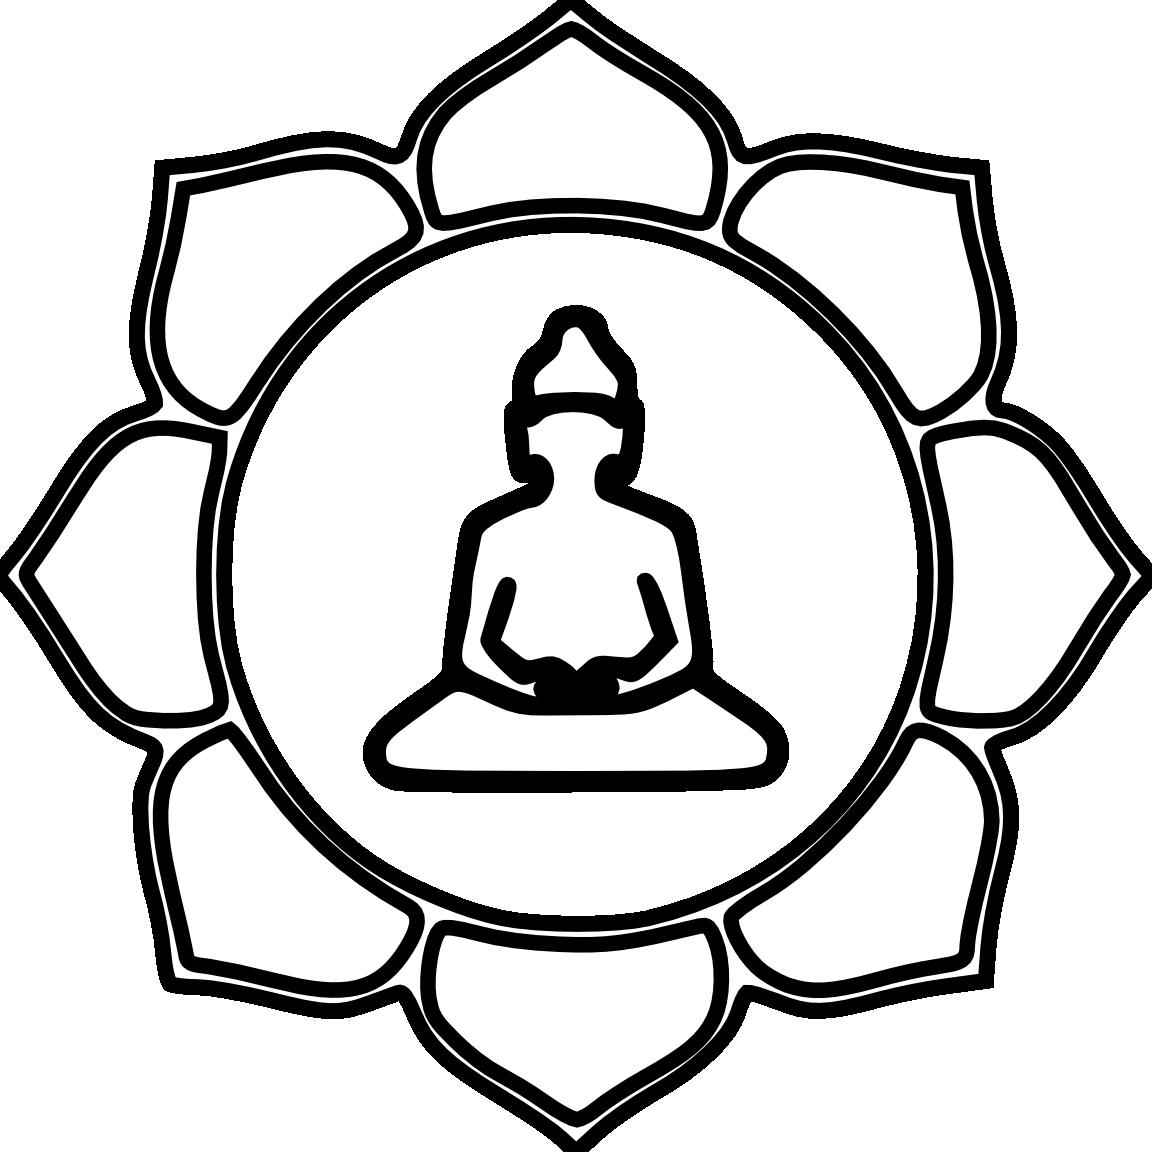 Tibetan long book clipart clip art free stock Buddha Flower Color Black White Line Art Coloring Book Colouring ... clip art free stock